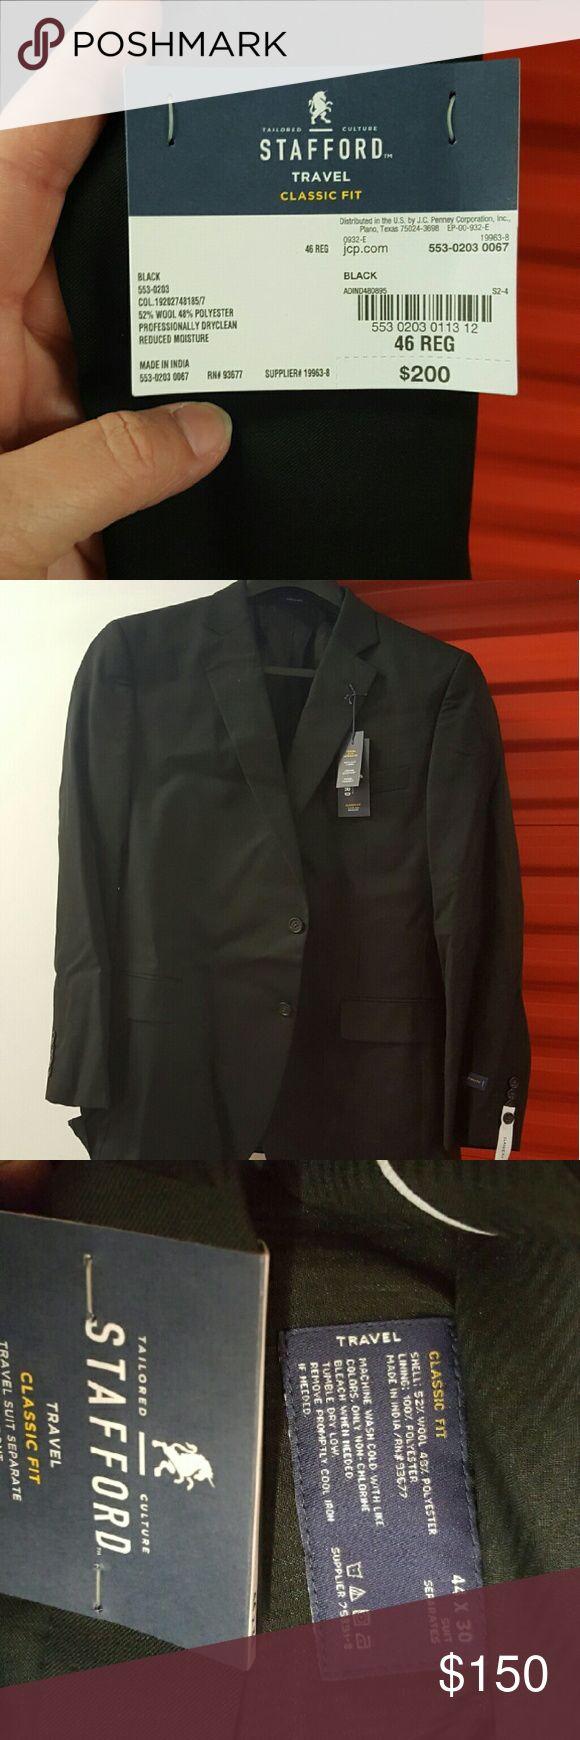 Men's Stafford Suit Black, Suit Jacket and Flat Front Slacks Stafford  Suits & Blazers Suits